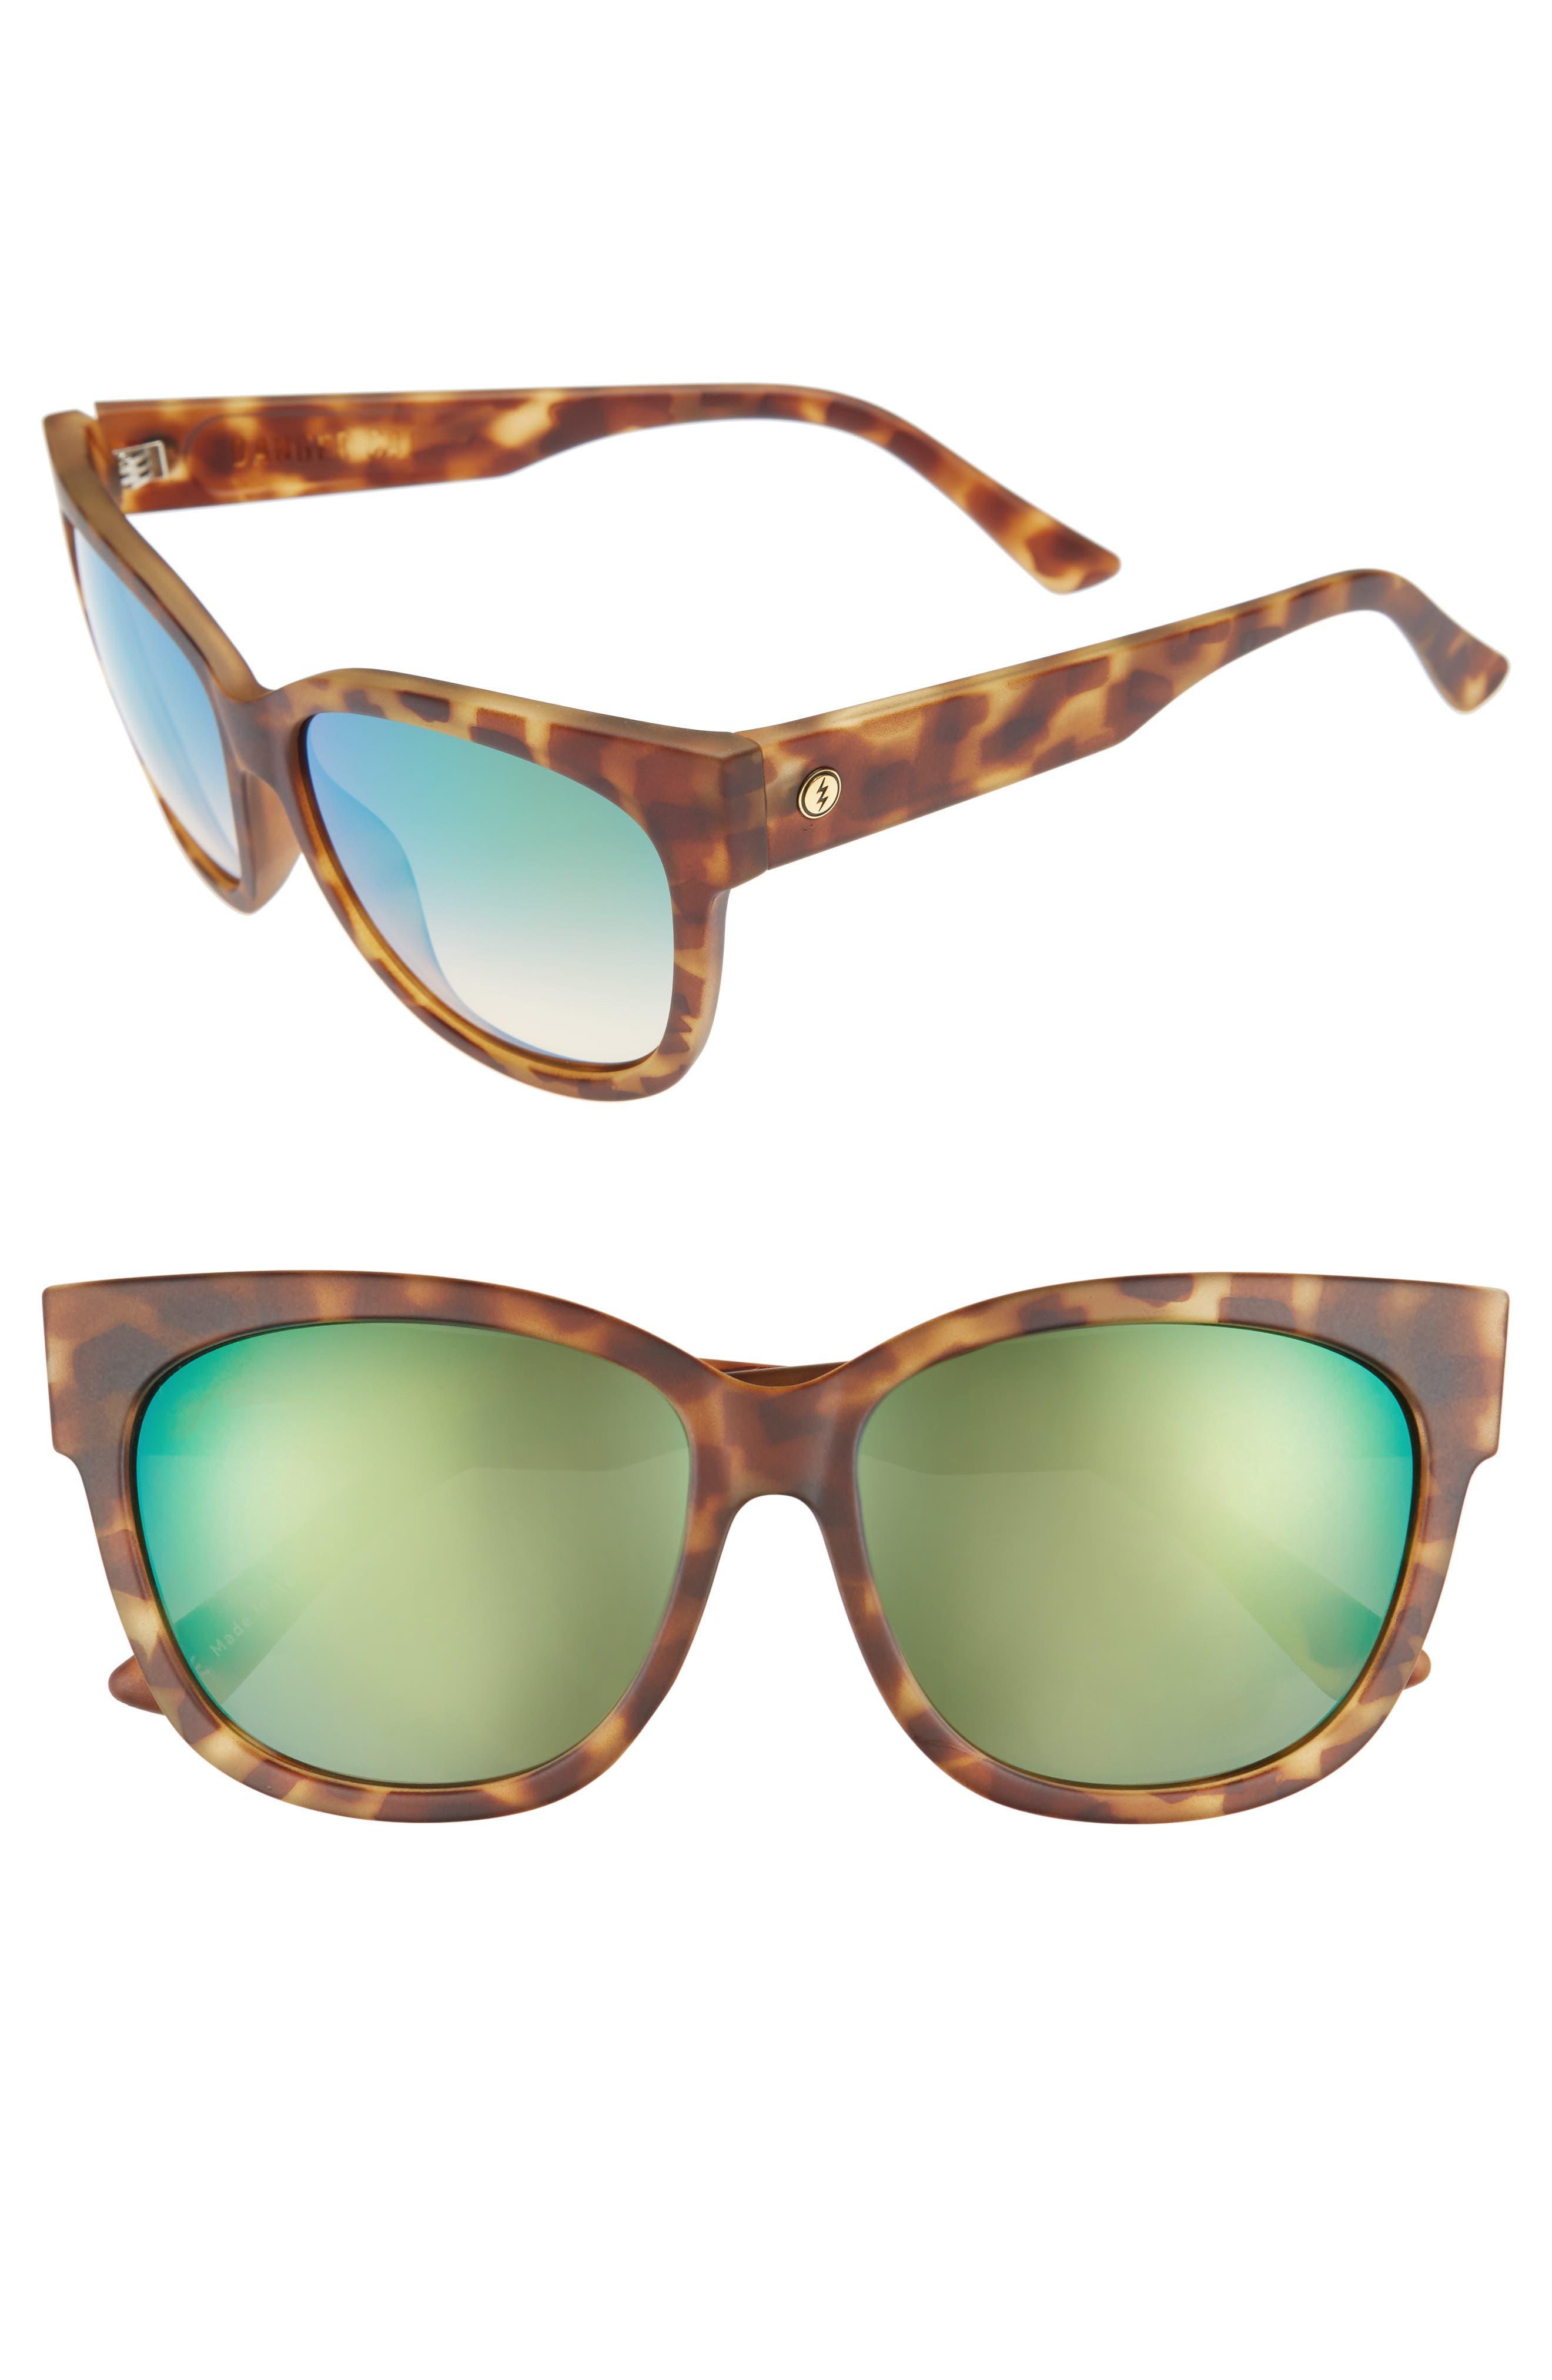 ELECTRIC Danger Cat 58mm Cat Eye Sunglasses